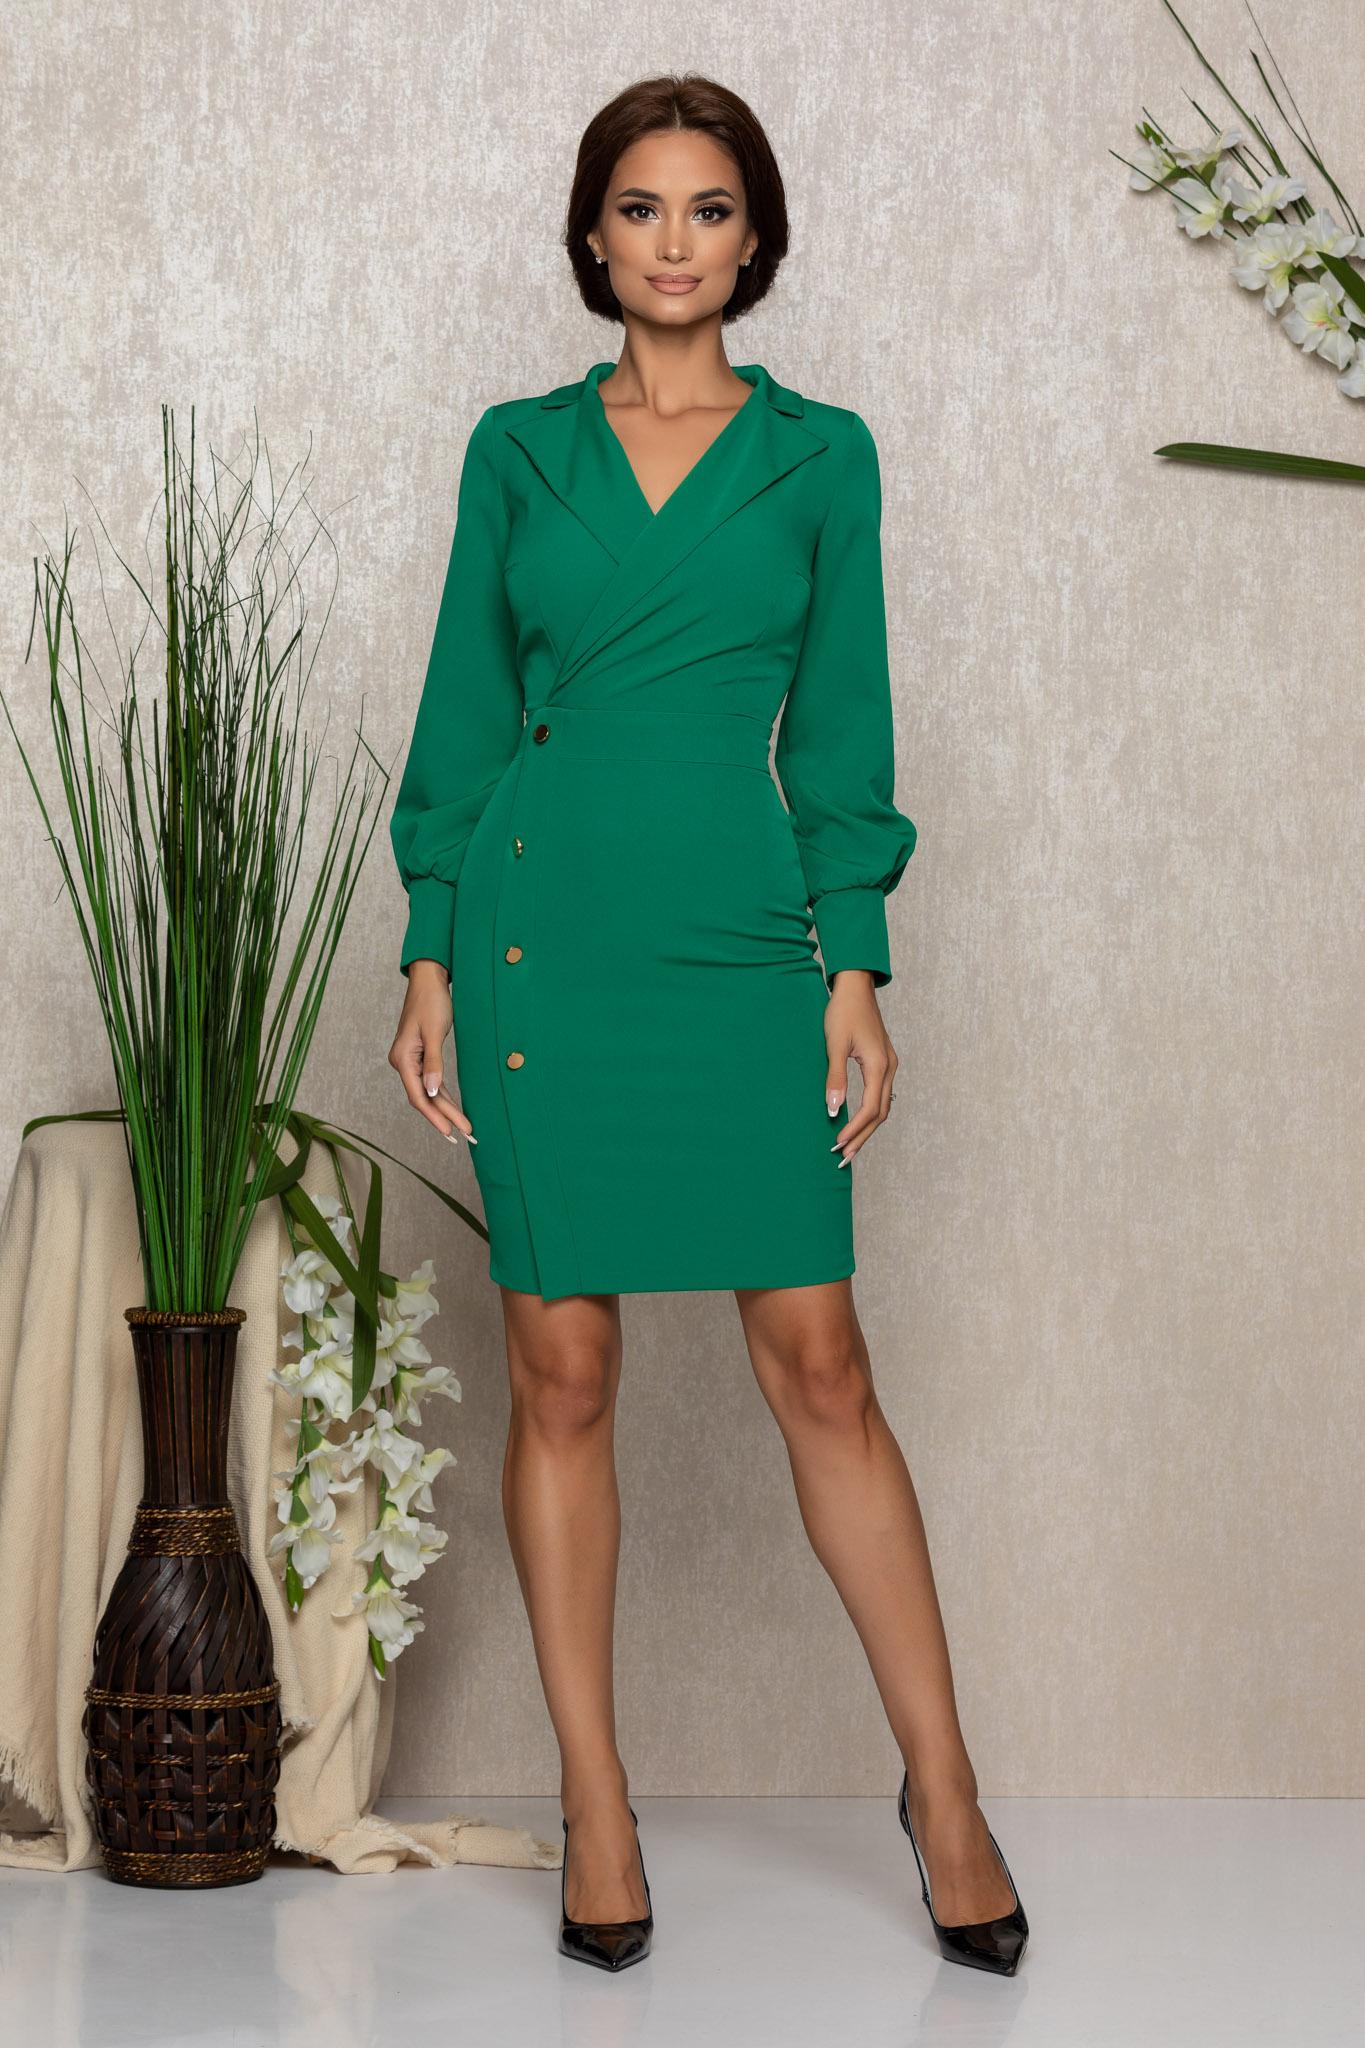 Rochie Moze Rafaela Verde Marimi Mari S (36)   M (38)   L (40)   XL (42)   XXL (44)   3XL (46)